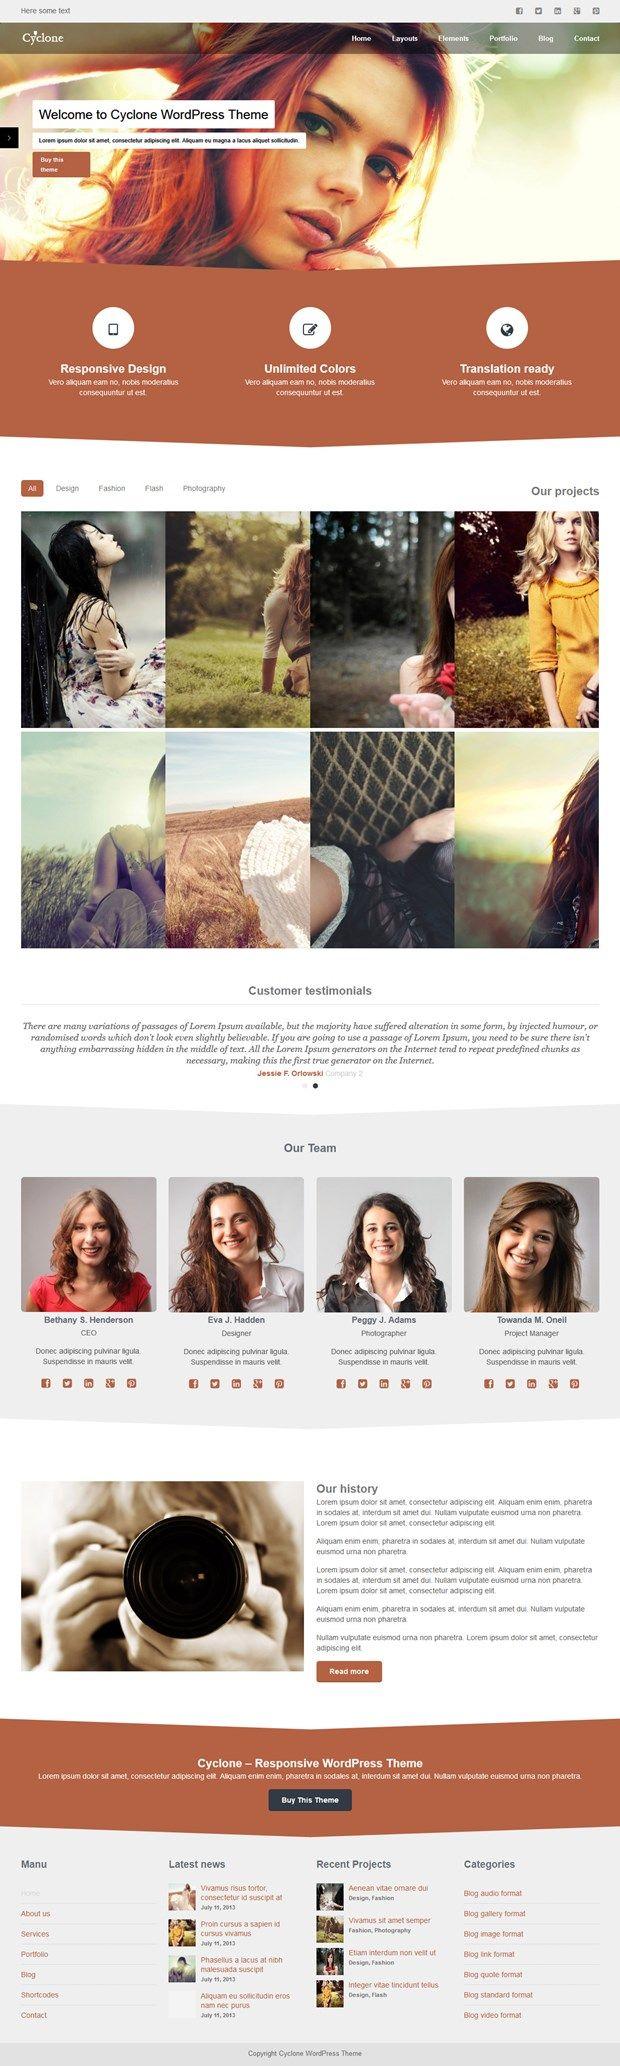 Responsive Photography WordPress Theme - Cyclone